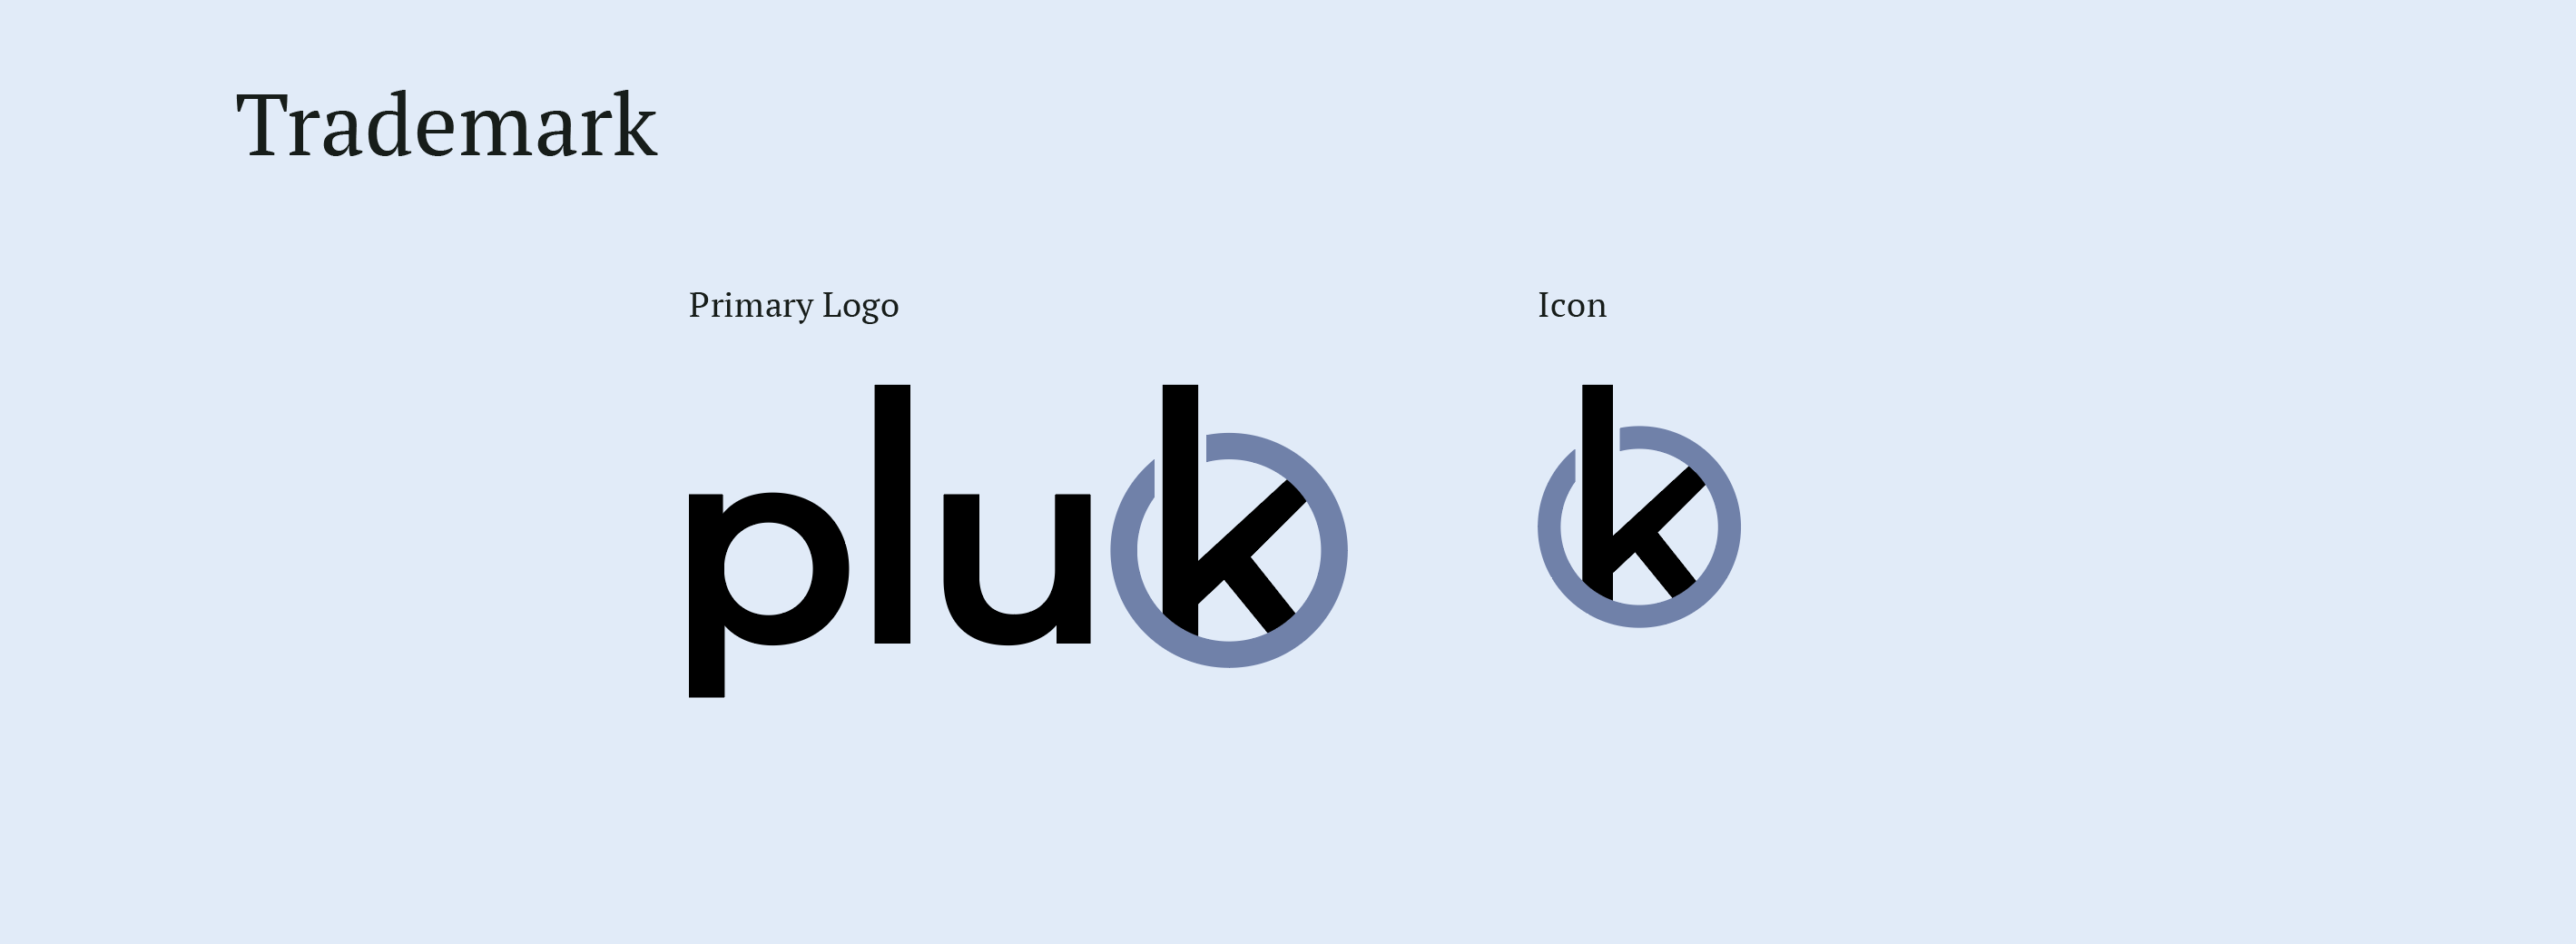 pluk logo and icon